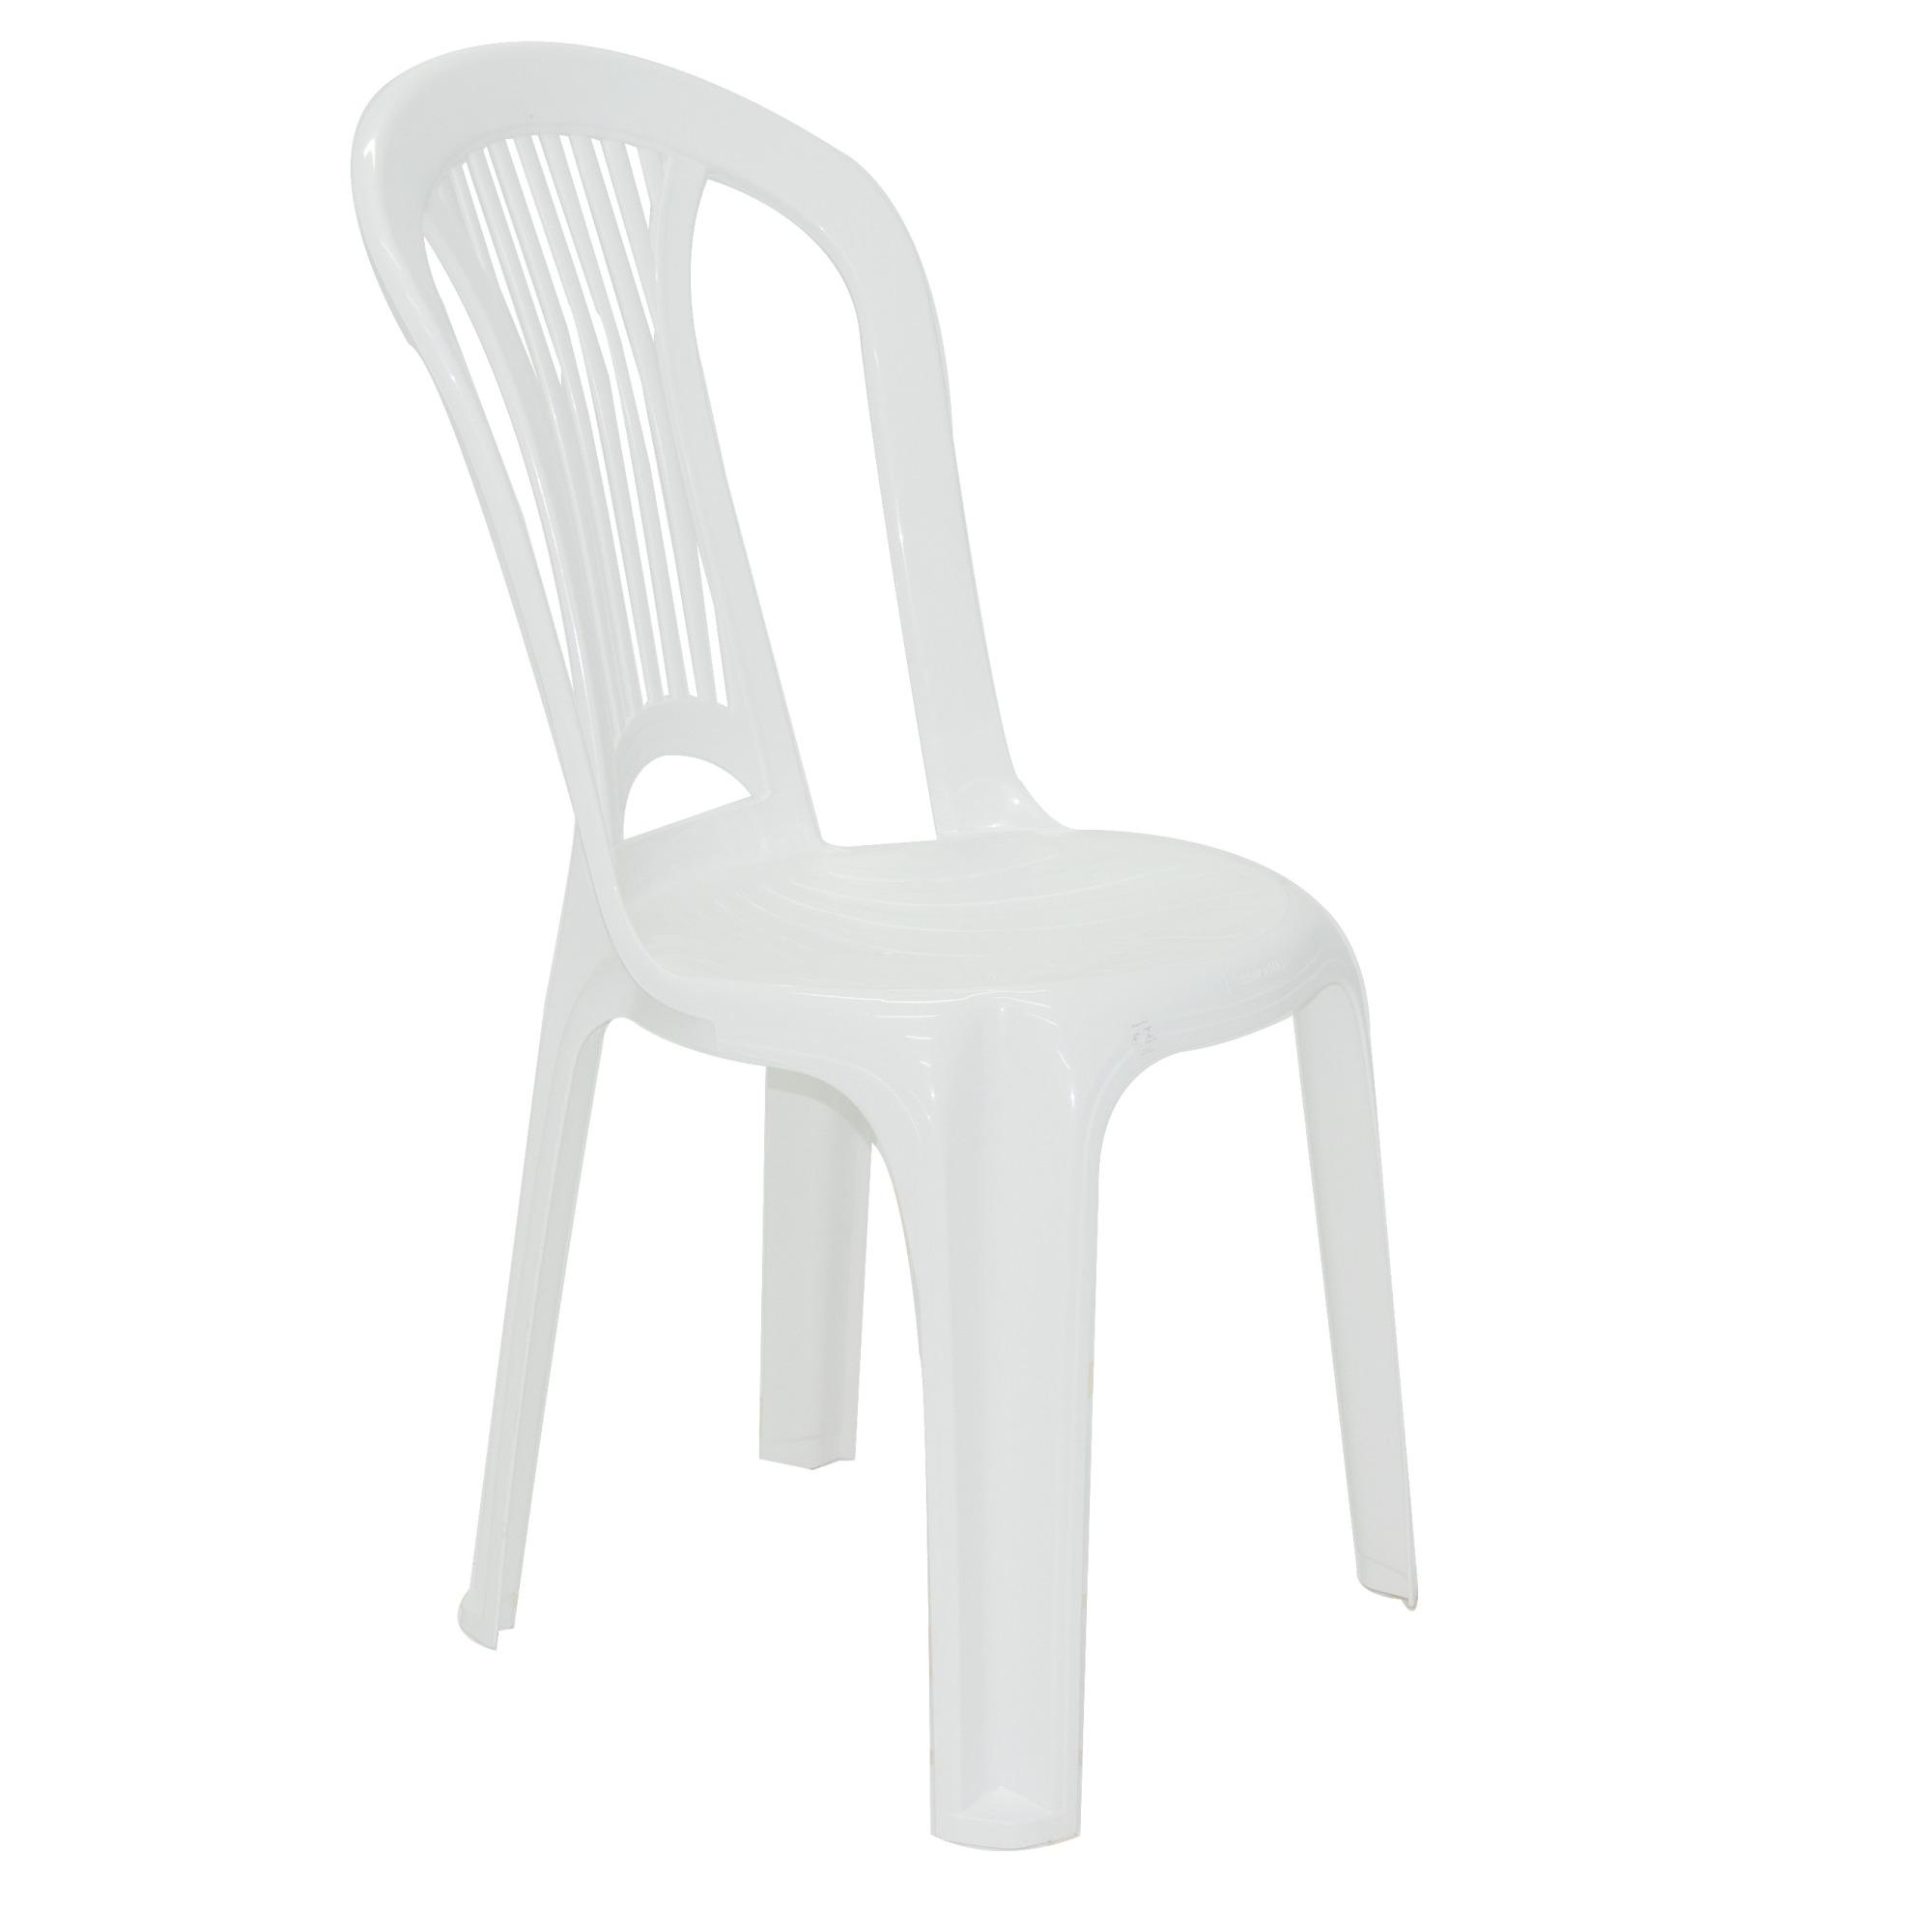 Cadeira Plastica Branca Tramontina Atlantida Basic Bistro